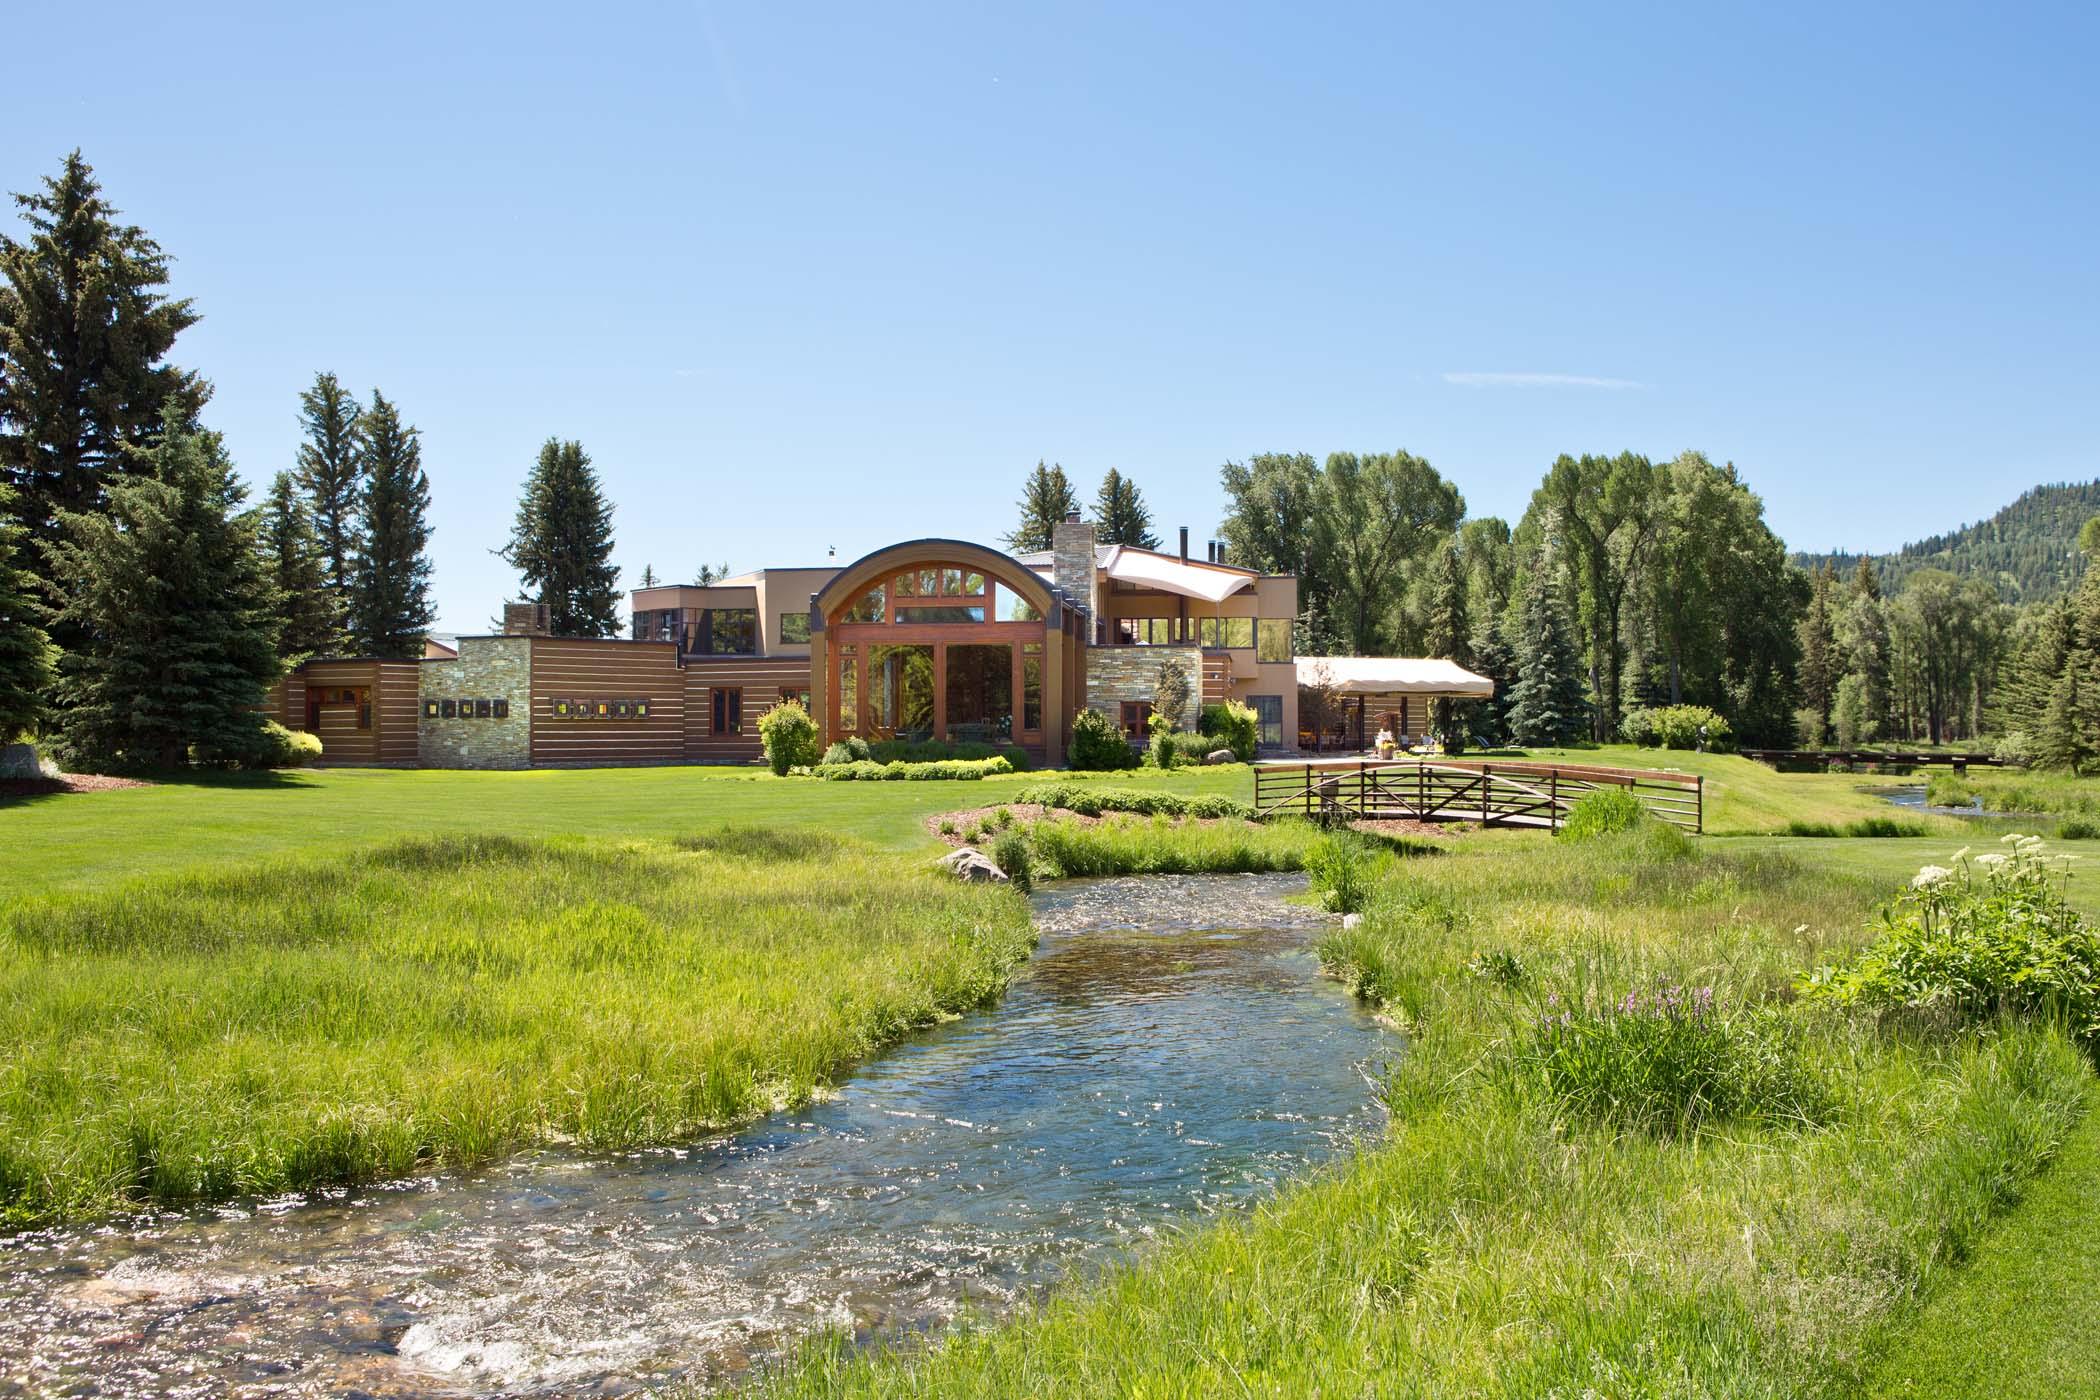 獨棟家庭住宅 為 出售 在 Creekside Elegance Jackson, 懷俄明州, 83001 Jackson Hole, 美國